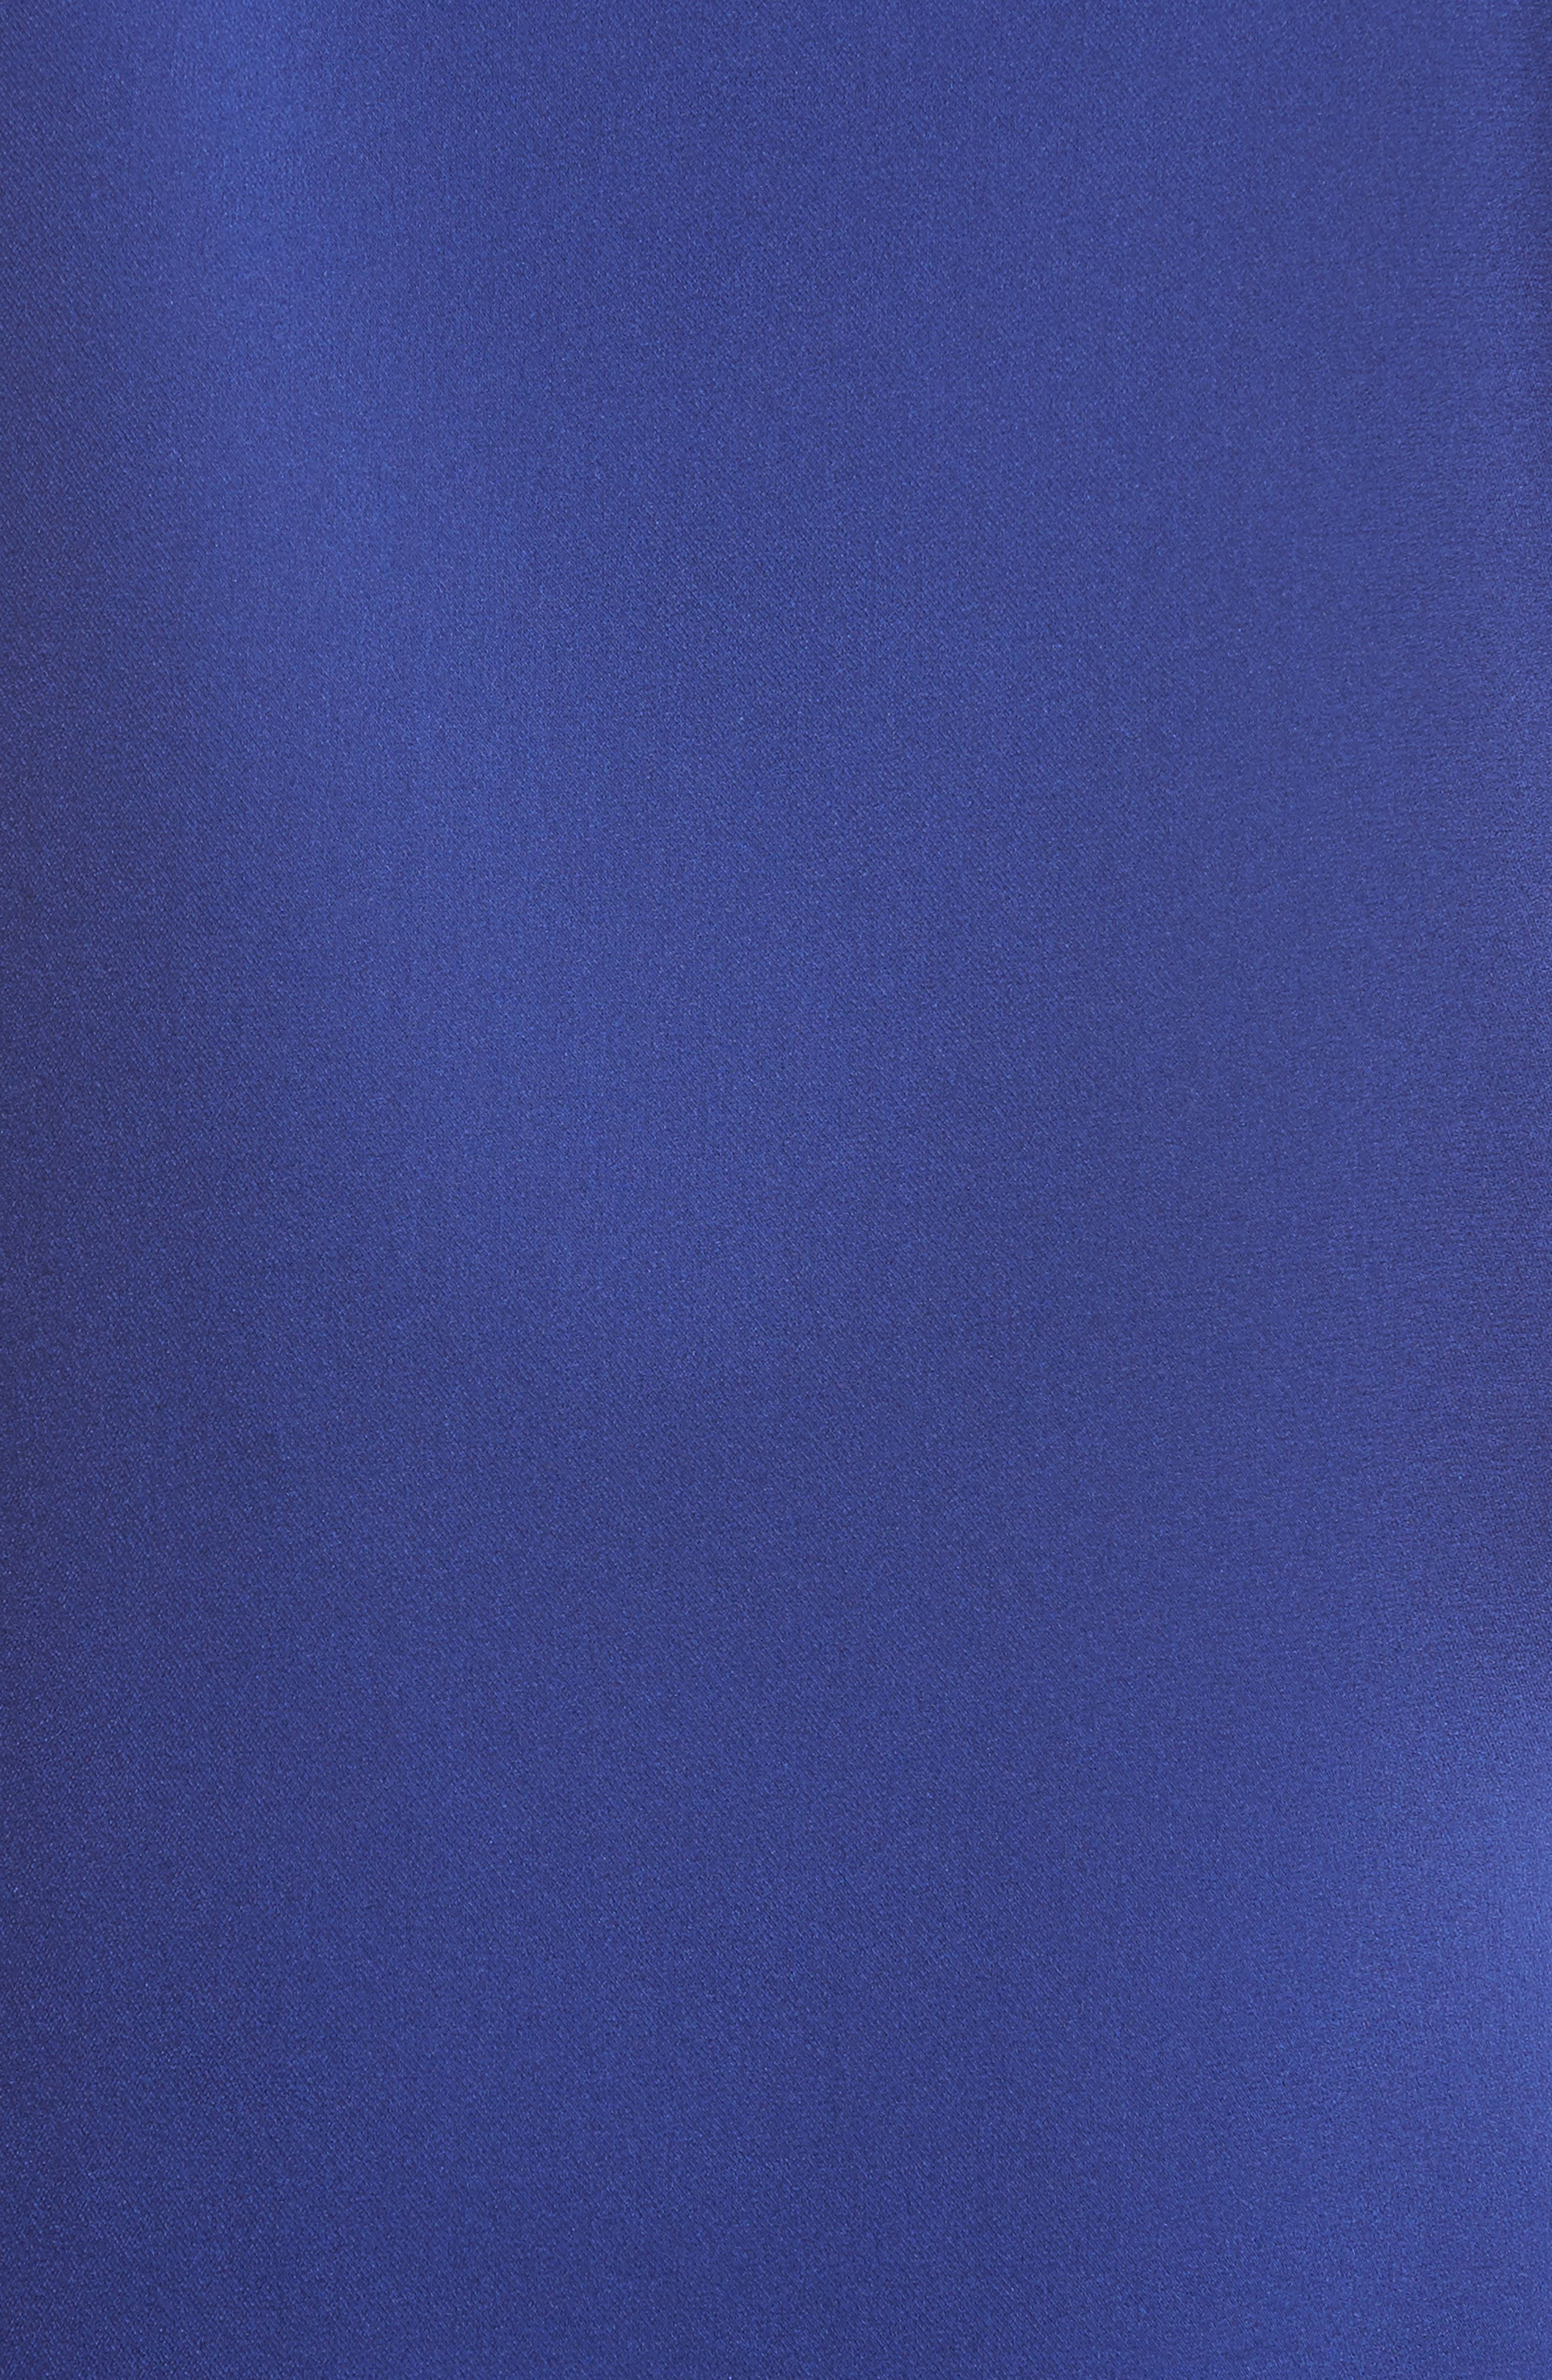 Removable Tie Stretch Silk Satin Georgette Blouse,                             Alternate thumbnail 6, color,                             430